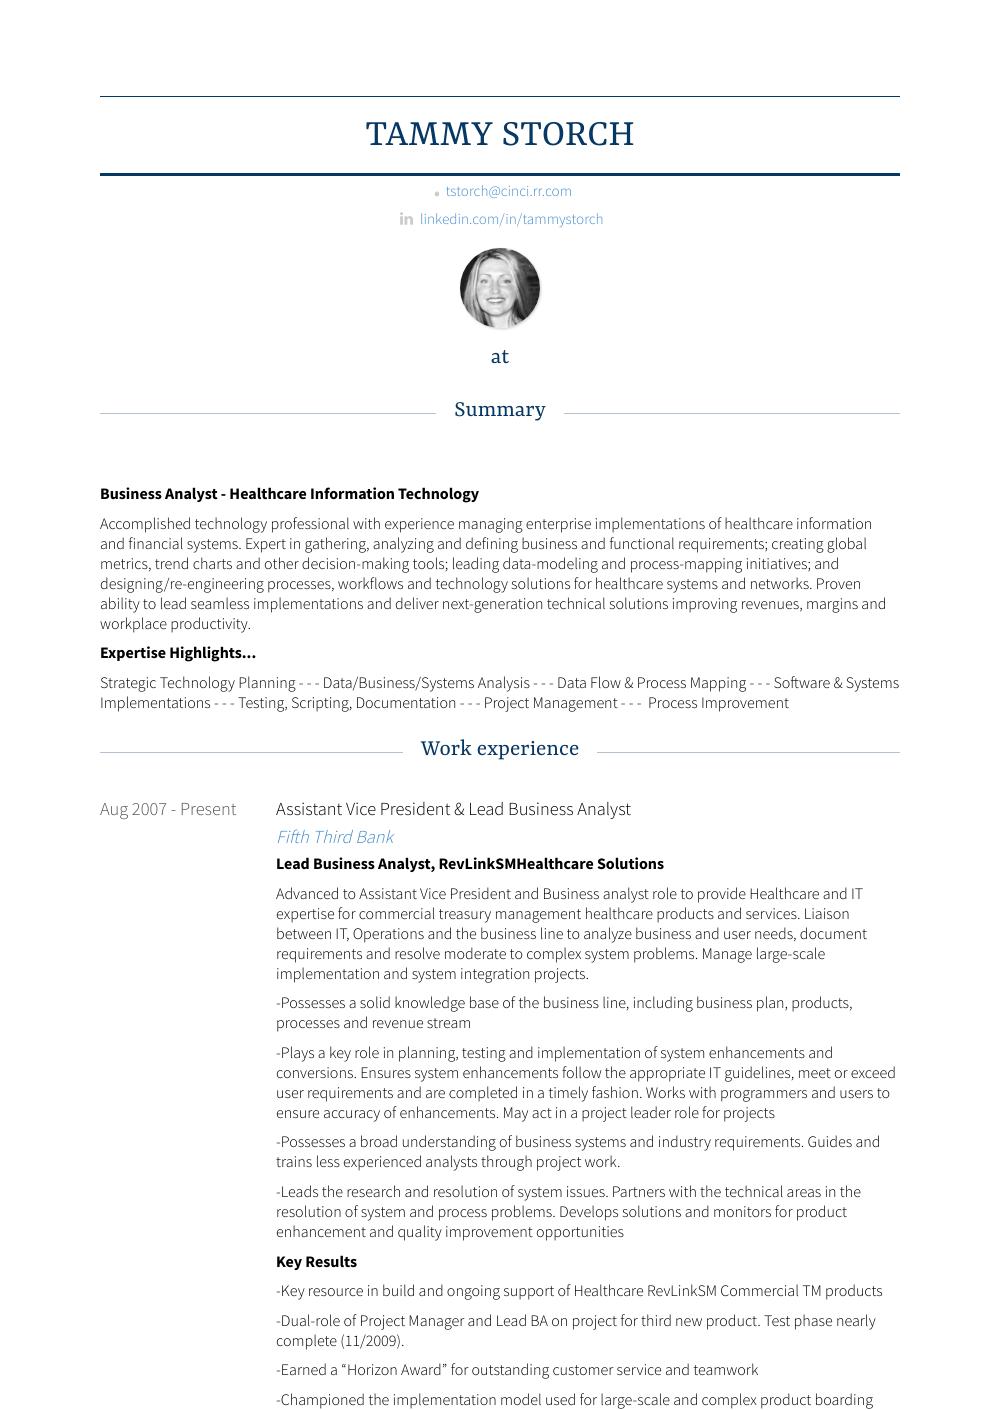 Assistant Vice President - Resume Samples & Templates | VisualCV